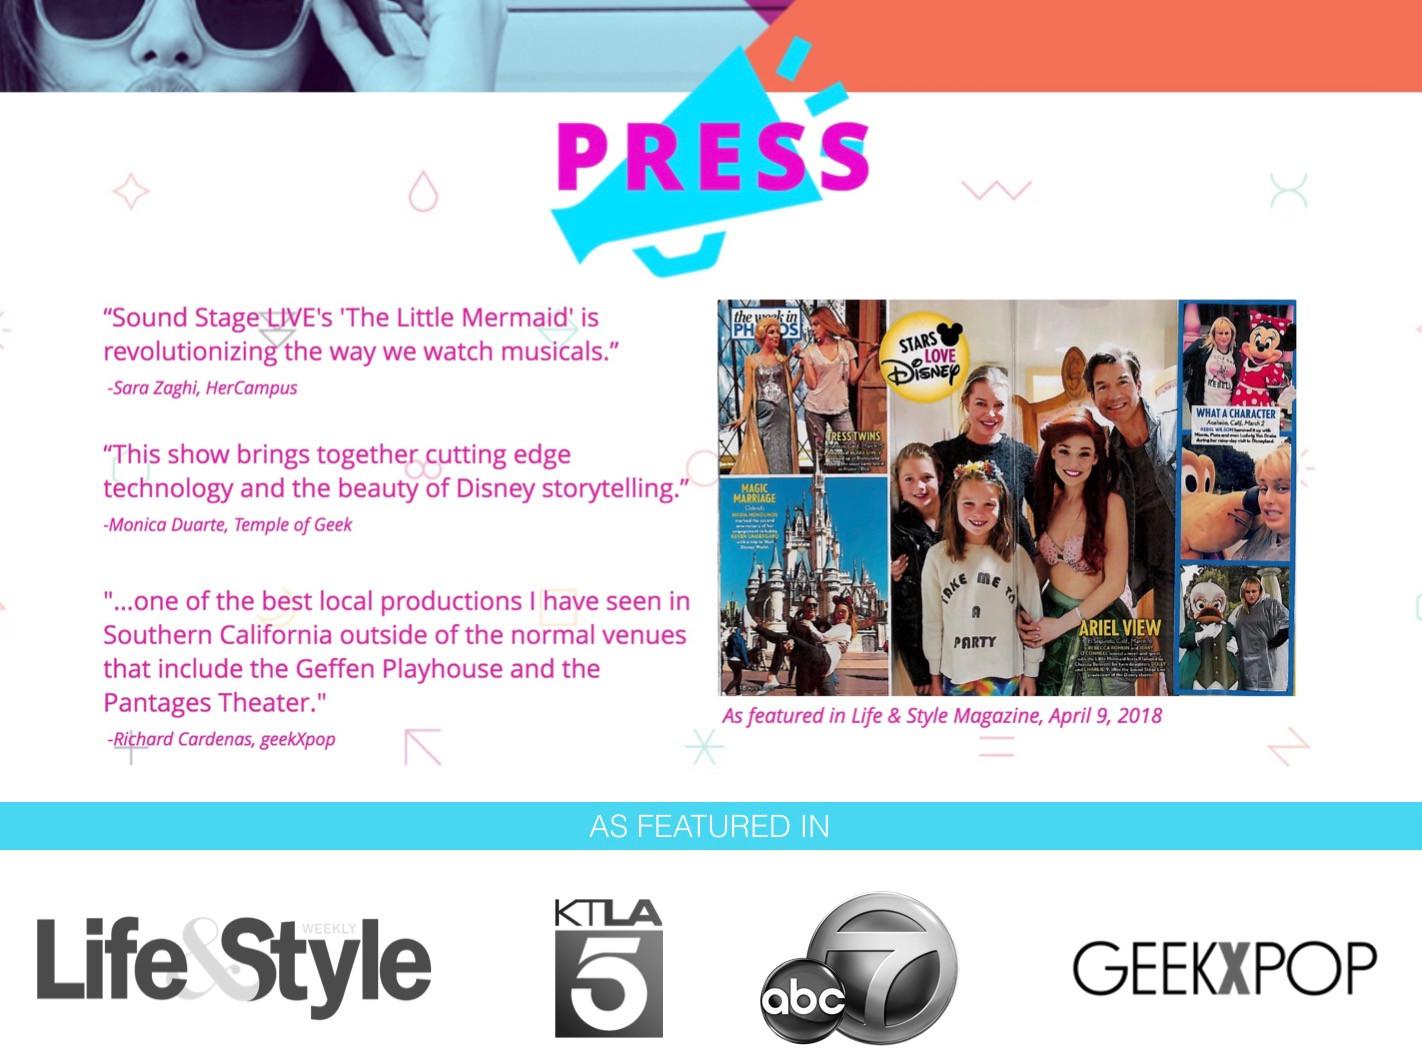 Press Clippings Presentation Slide